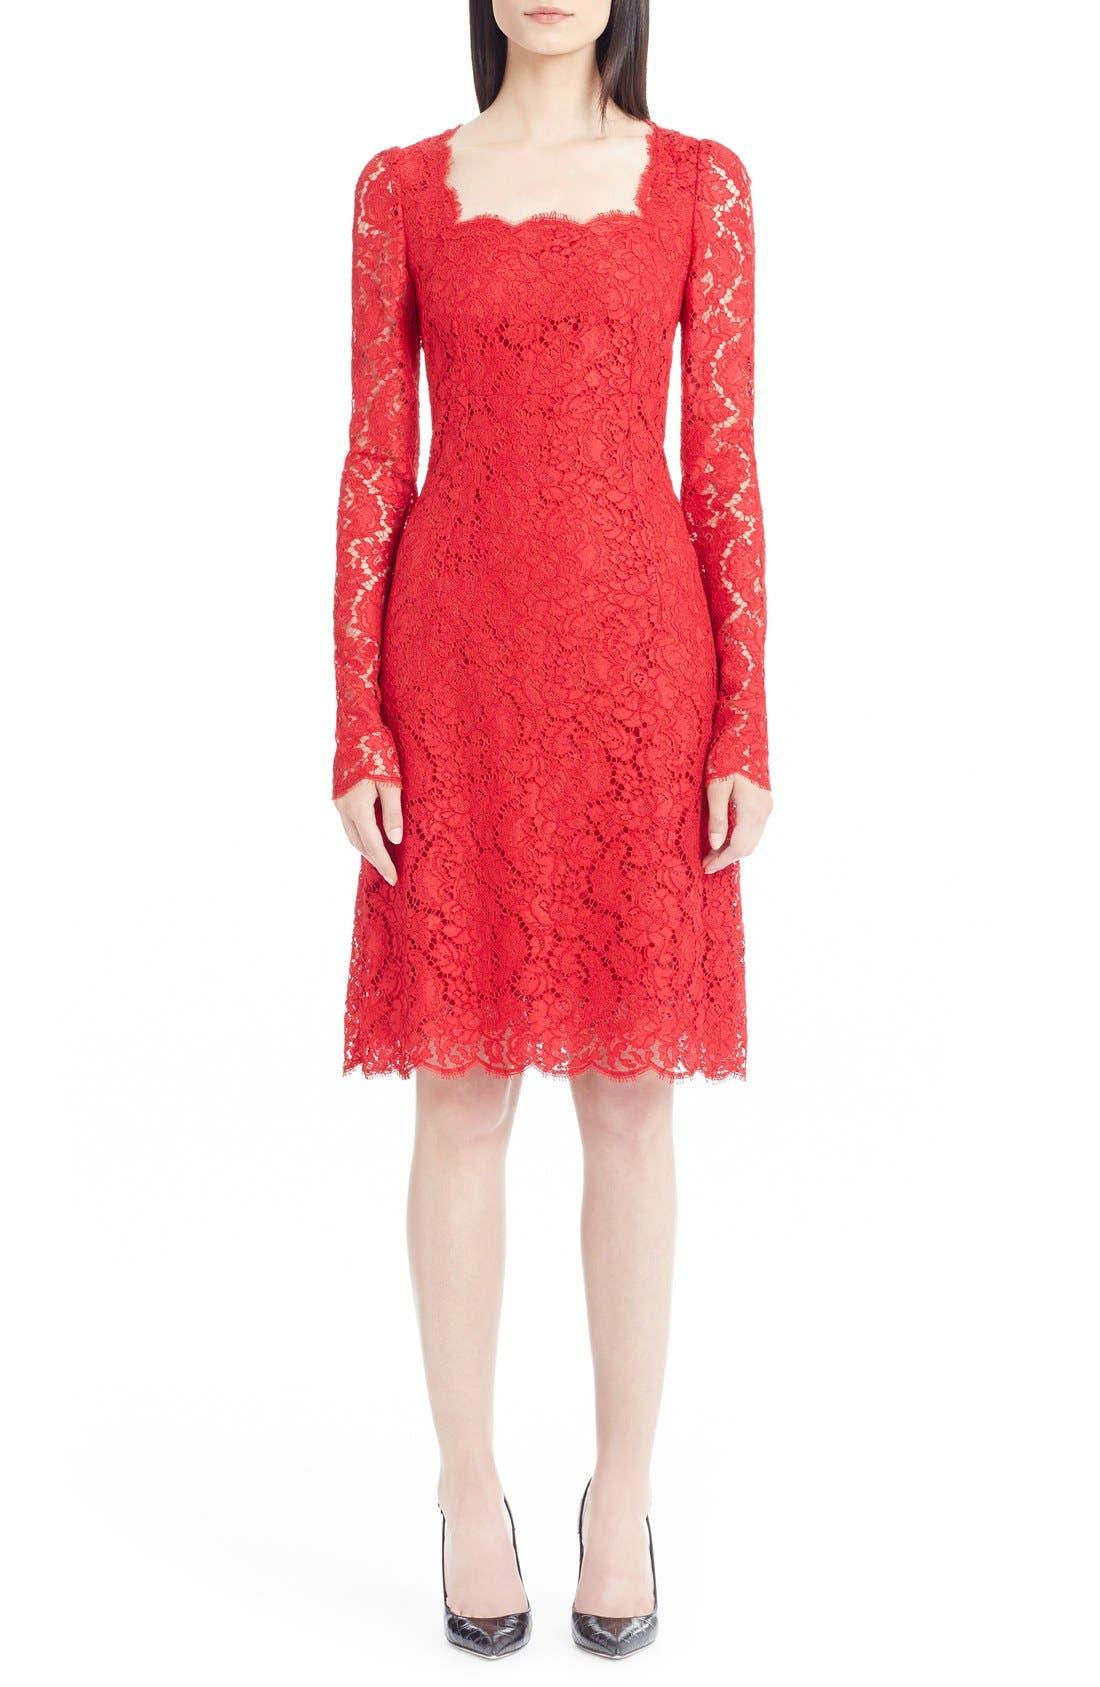 Alternate Image 1 Selected - Dolce&Gabbana Square Neck Lace Dress